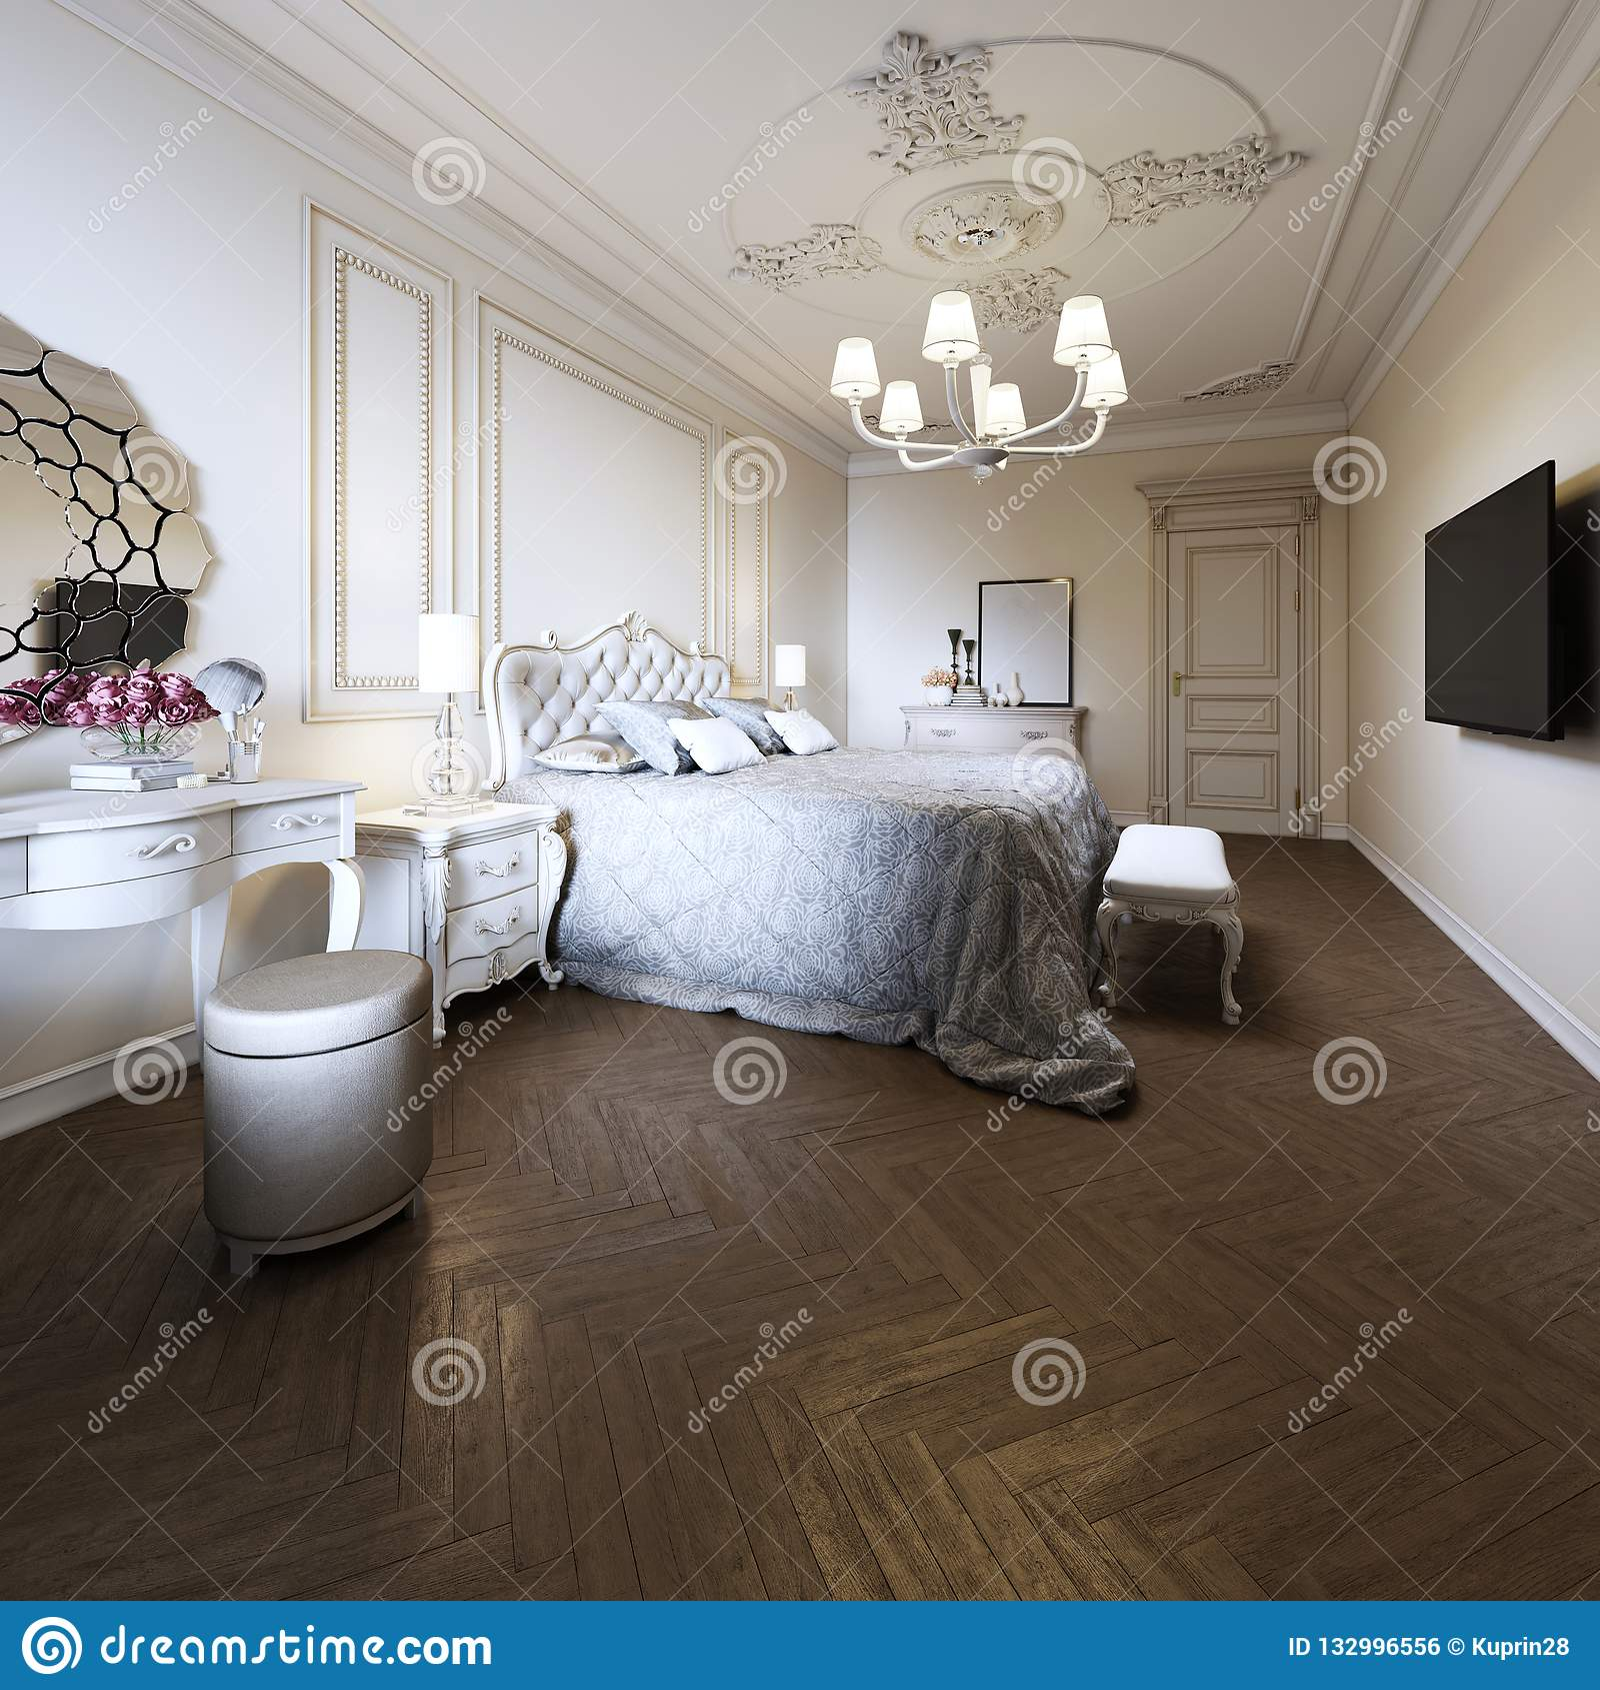 Bedroom Interior Design In A Modern Classic Style Stock Illustration Illustration Of Decor Molding 132996556